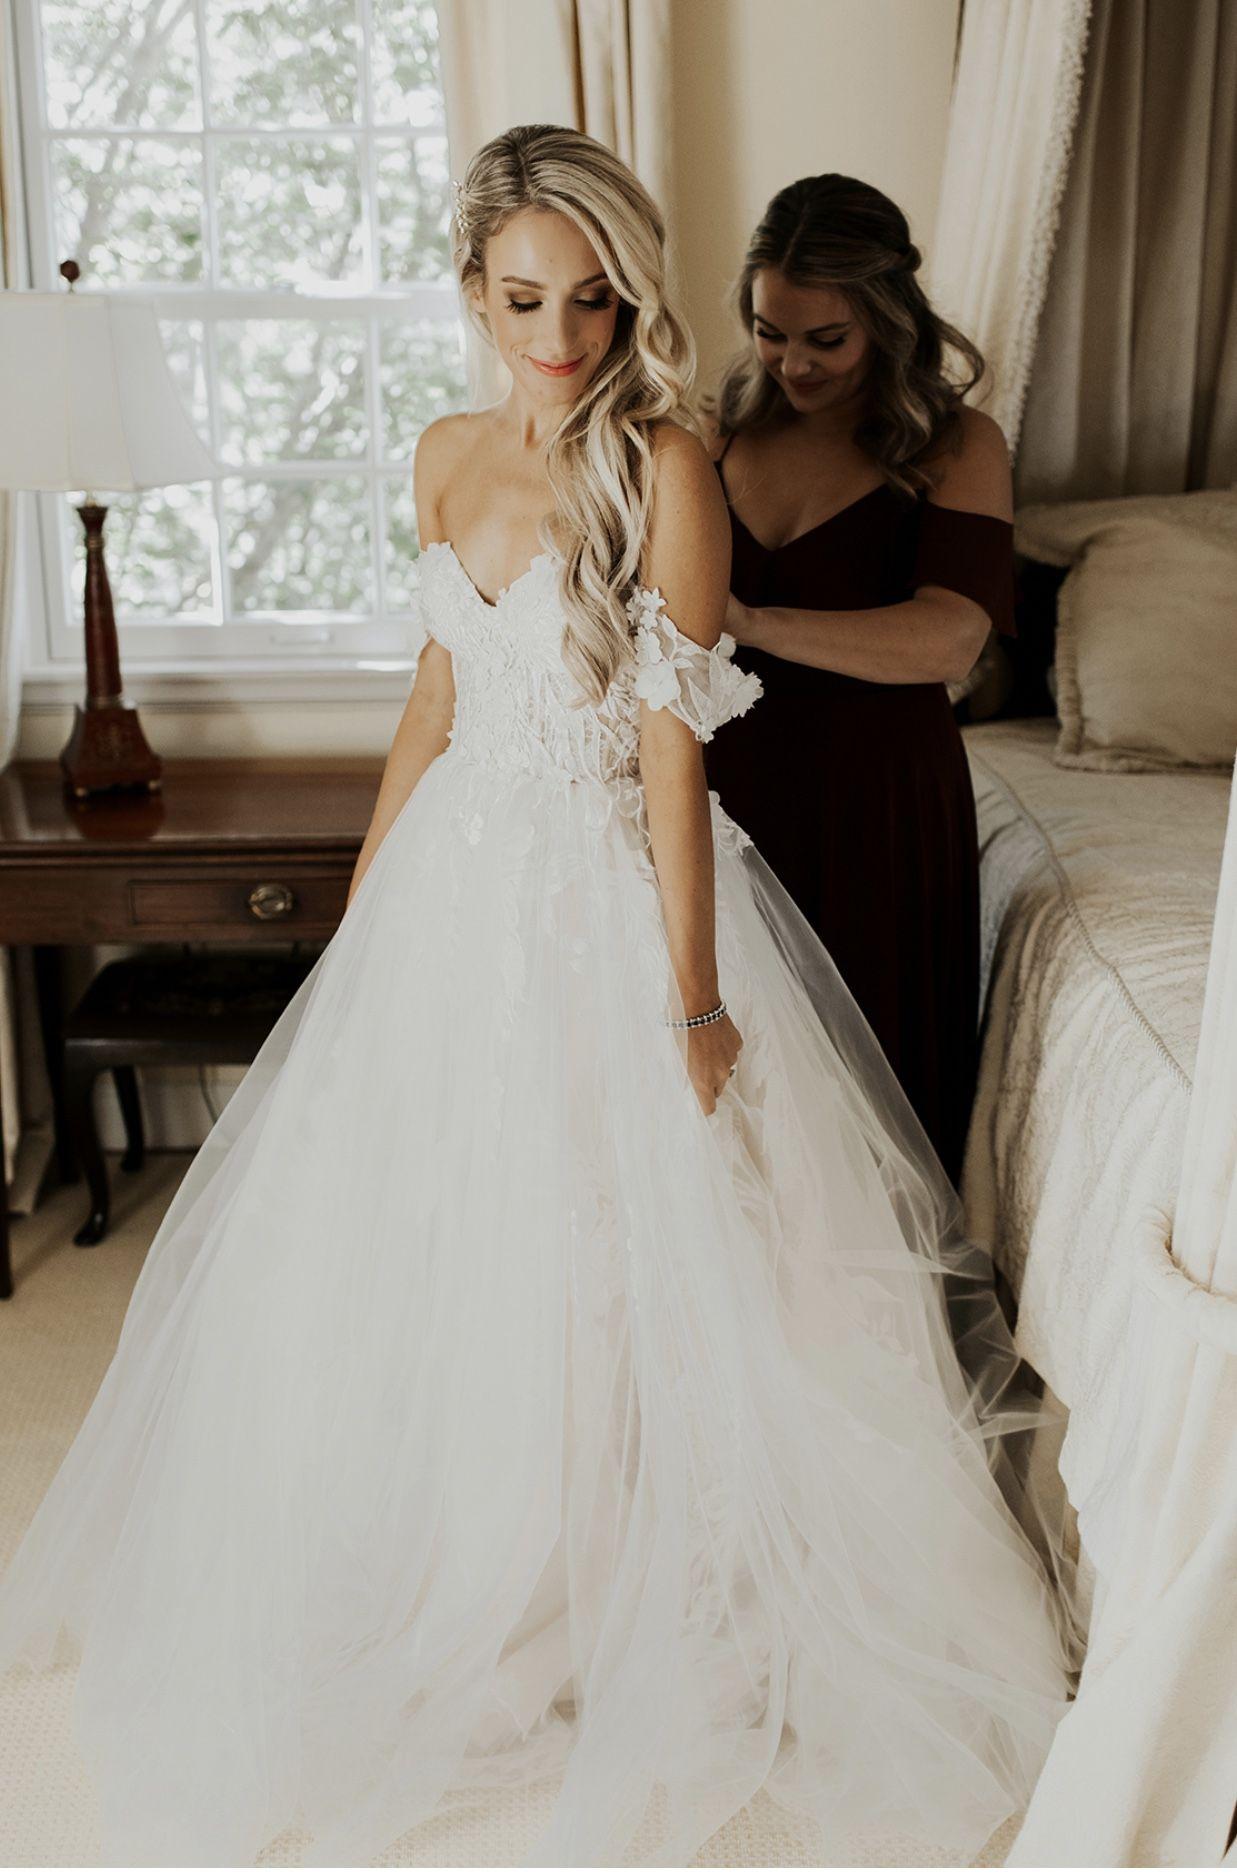 Pin By Jennifer May On Wedding Wedding Dresses Wedding Gowns Wedding Reveal [ 1876 x 1237 Pixel ]